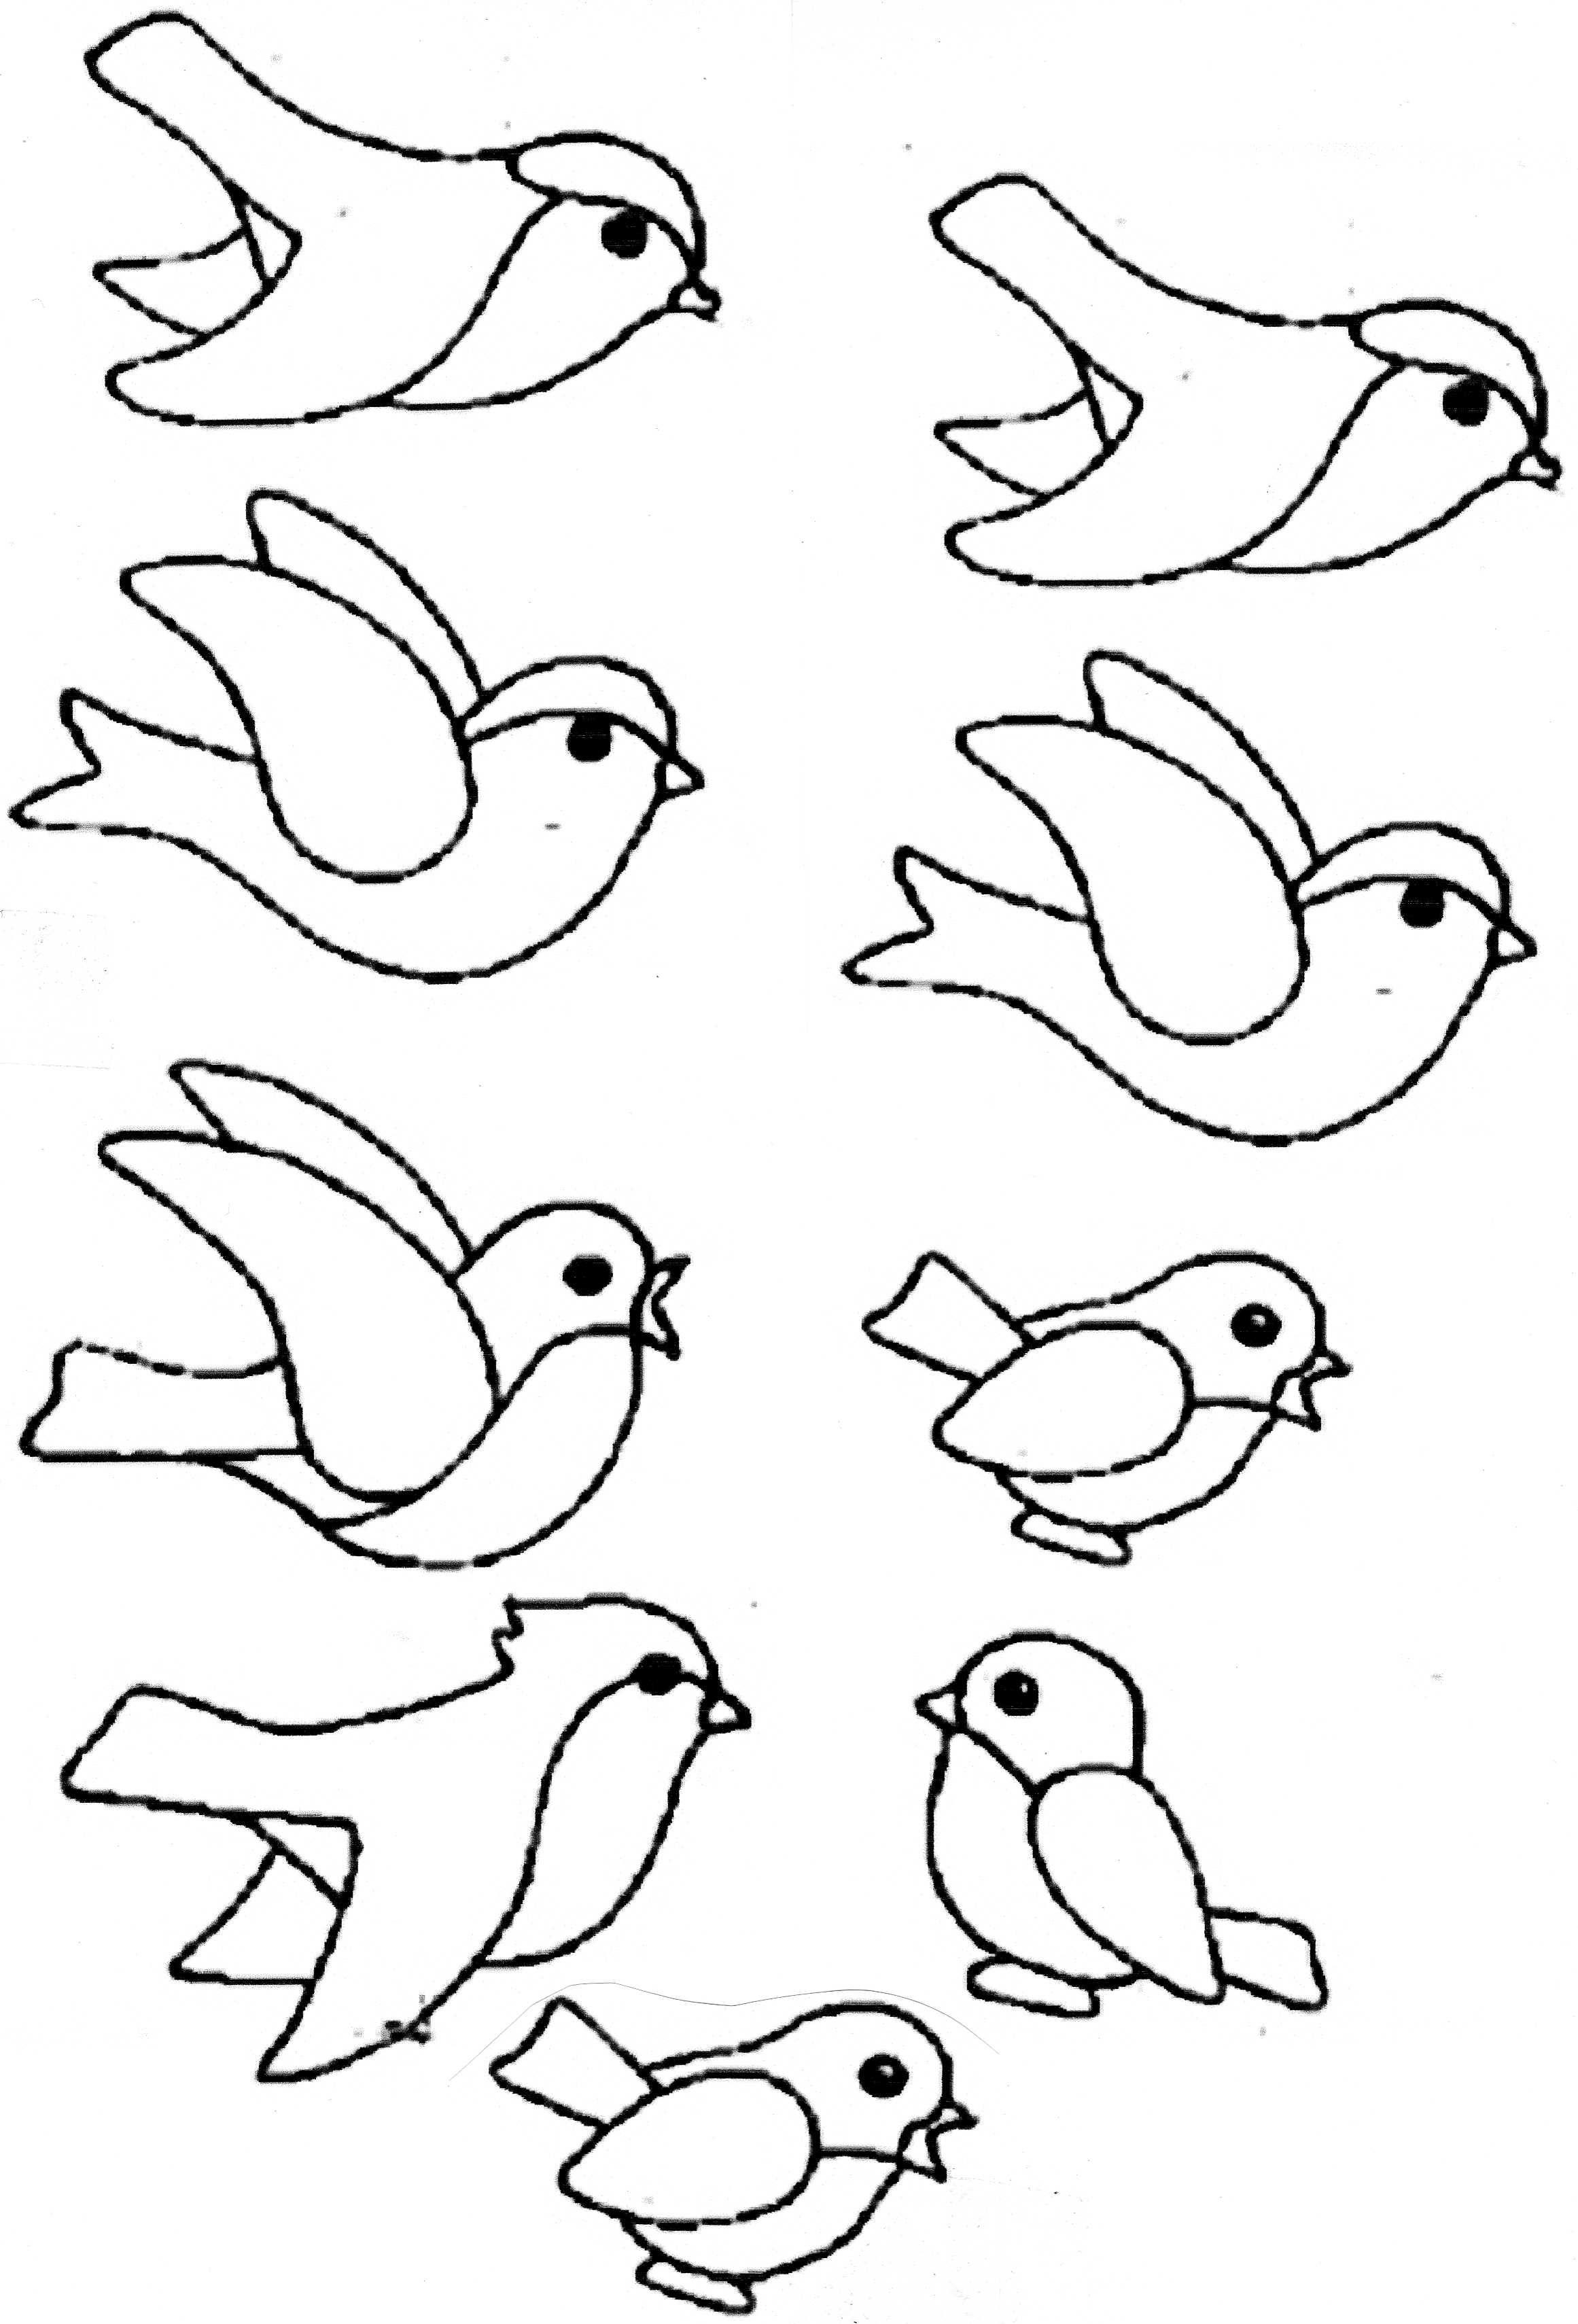 Madareteto Rajz Google Kereses Bird Crafts Winter Crafts Spring Crafts For Kids